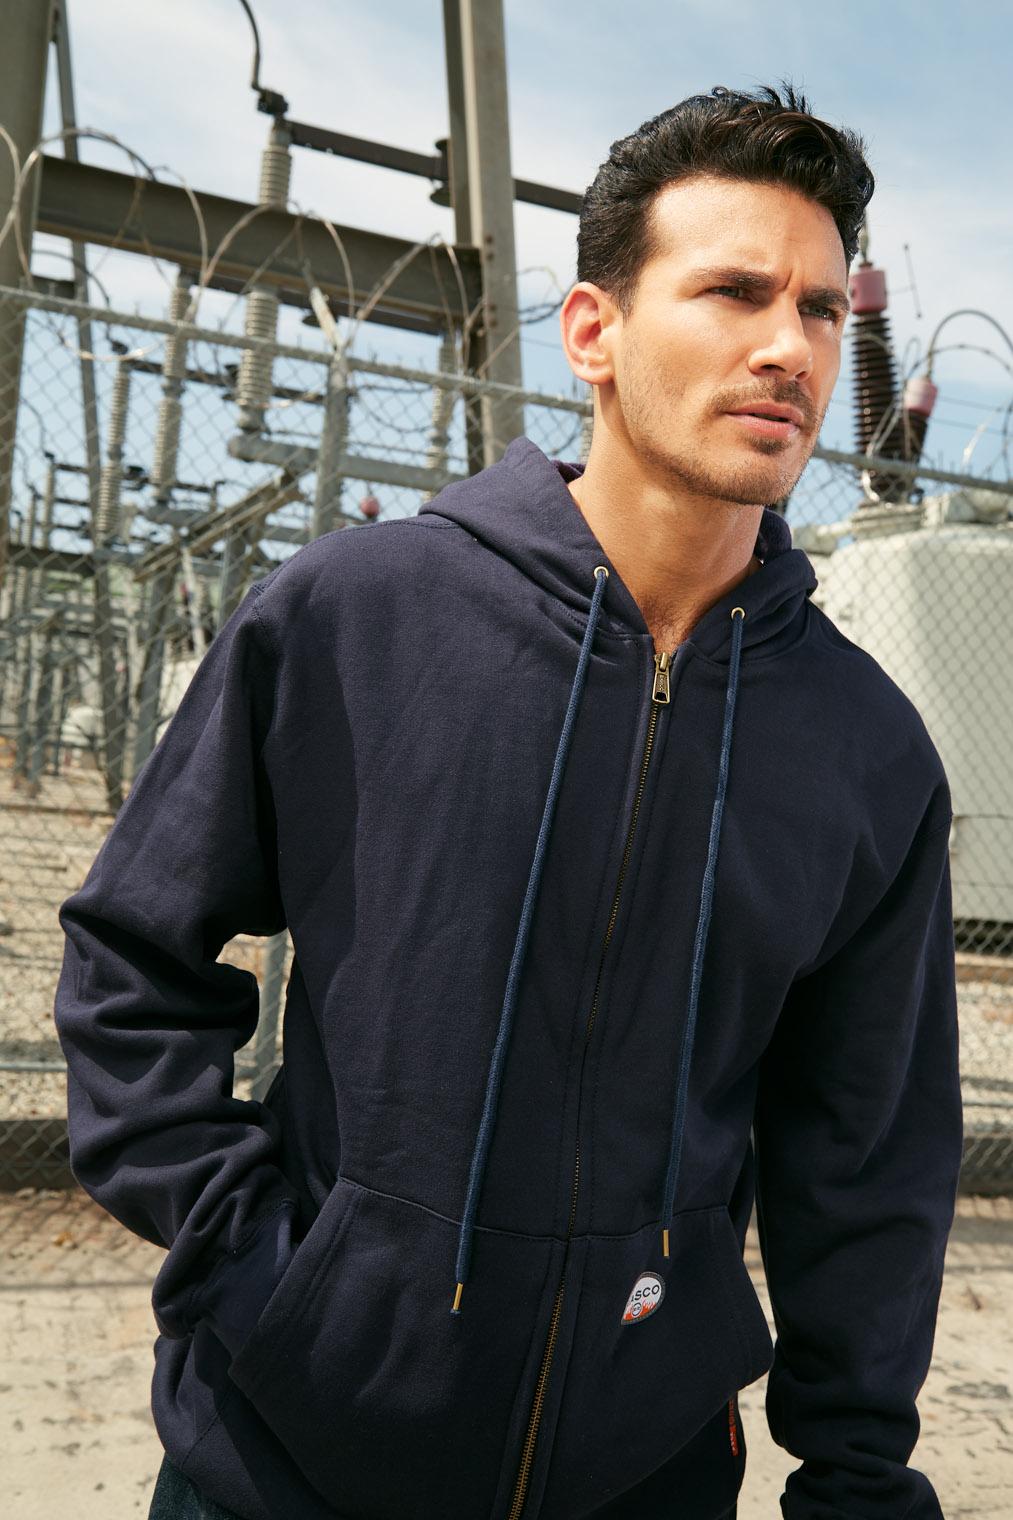 man in work shirt at power station workwear